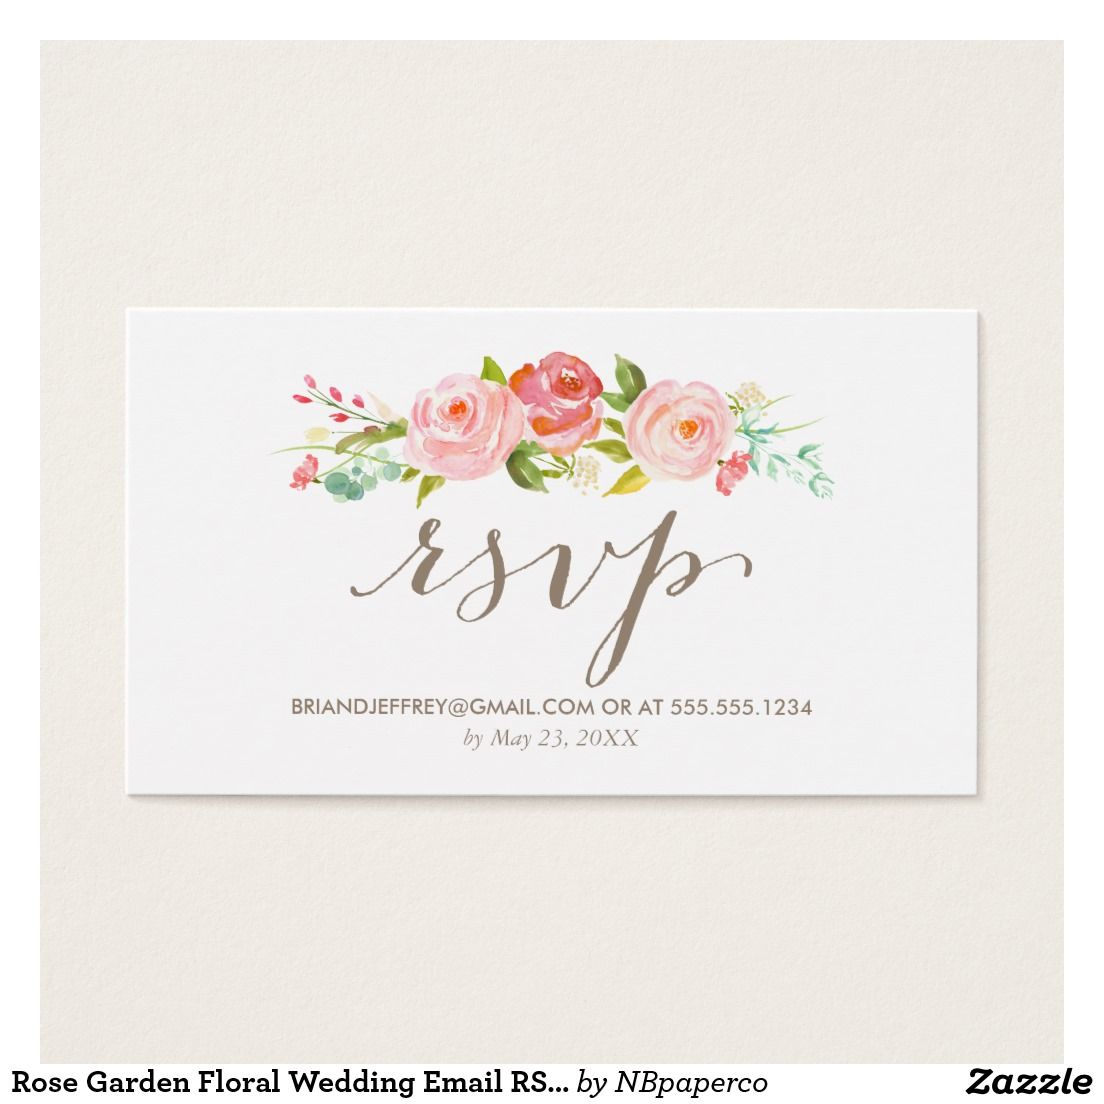 Fun Wedding Rsvp Card Wording: Rose Garden Floral Wedding Email RSVP Enclosure Card